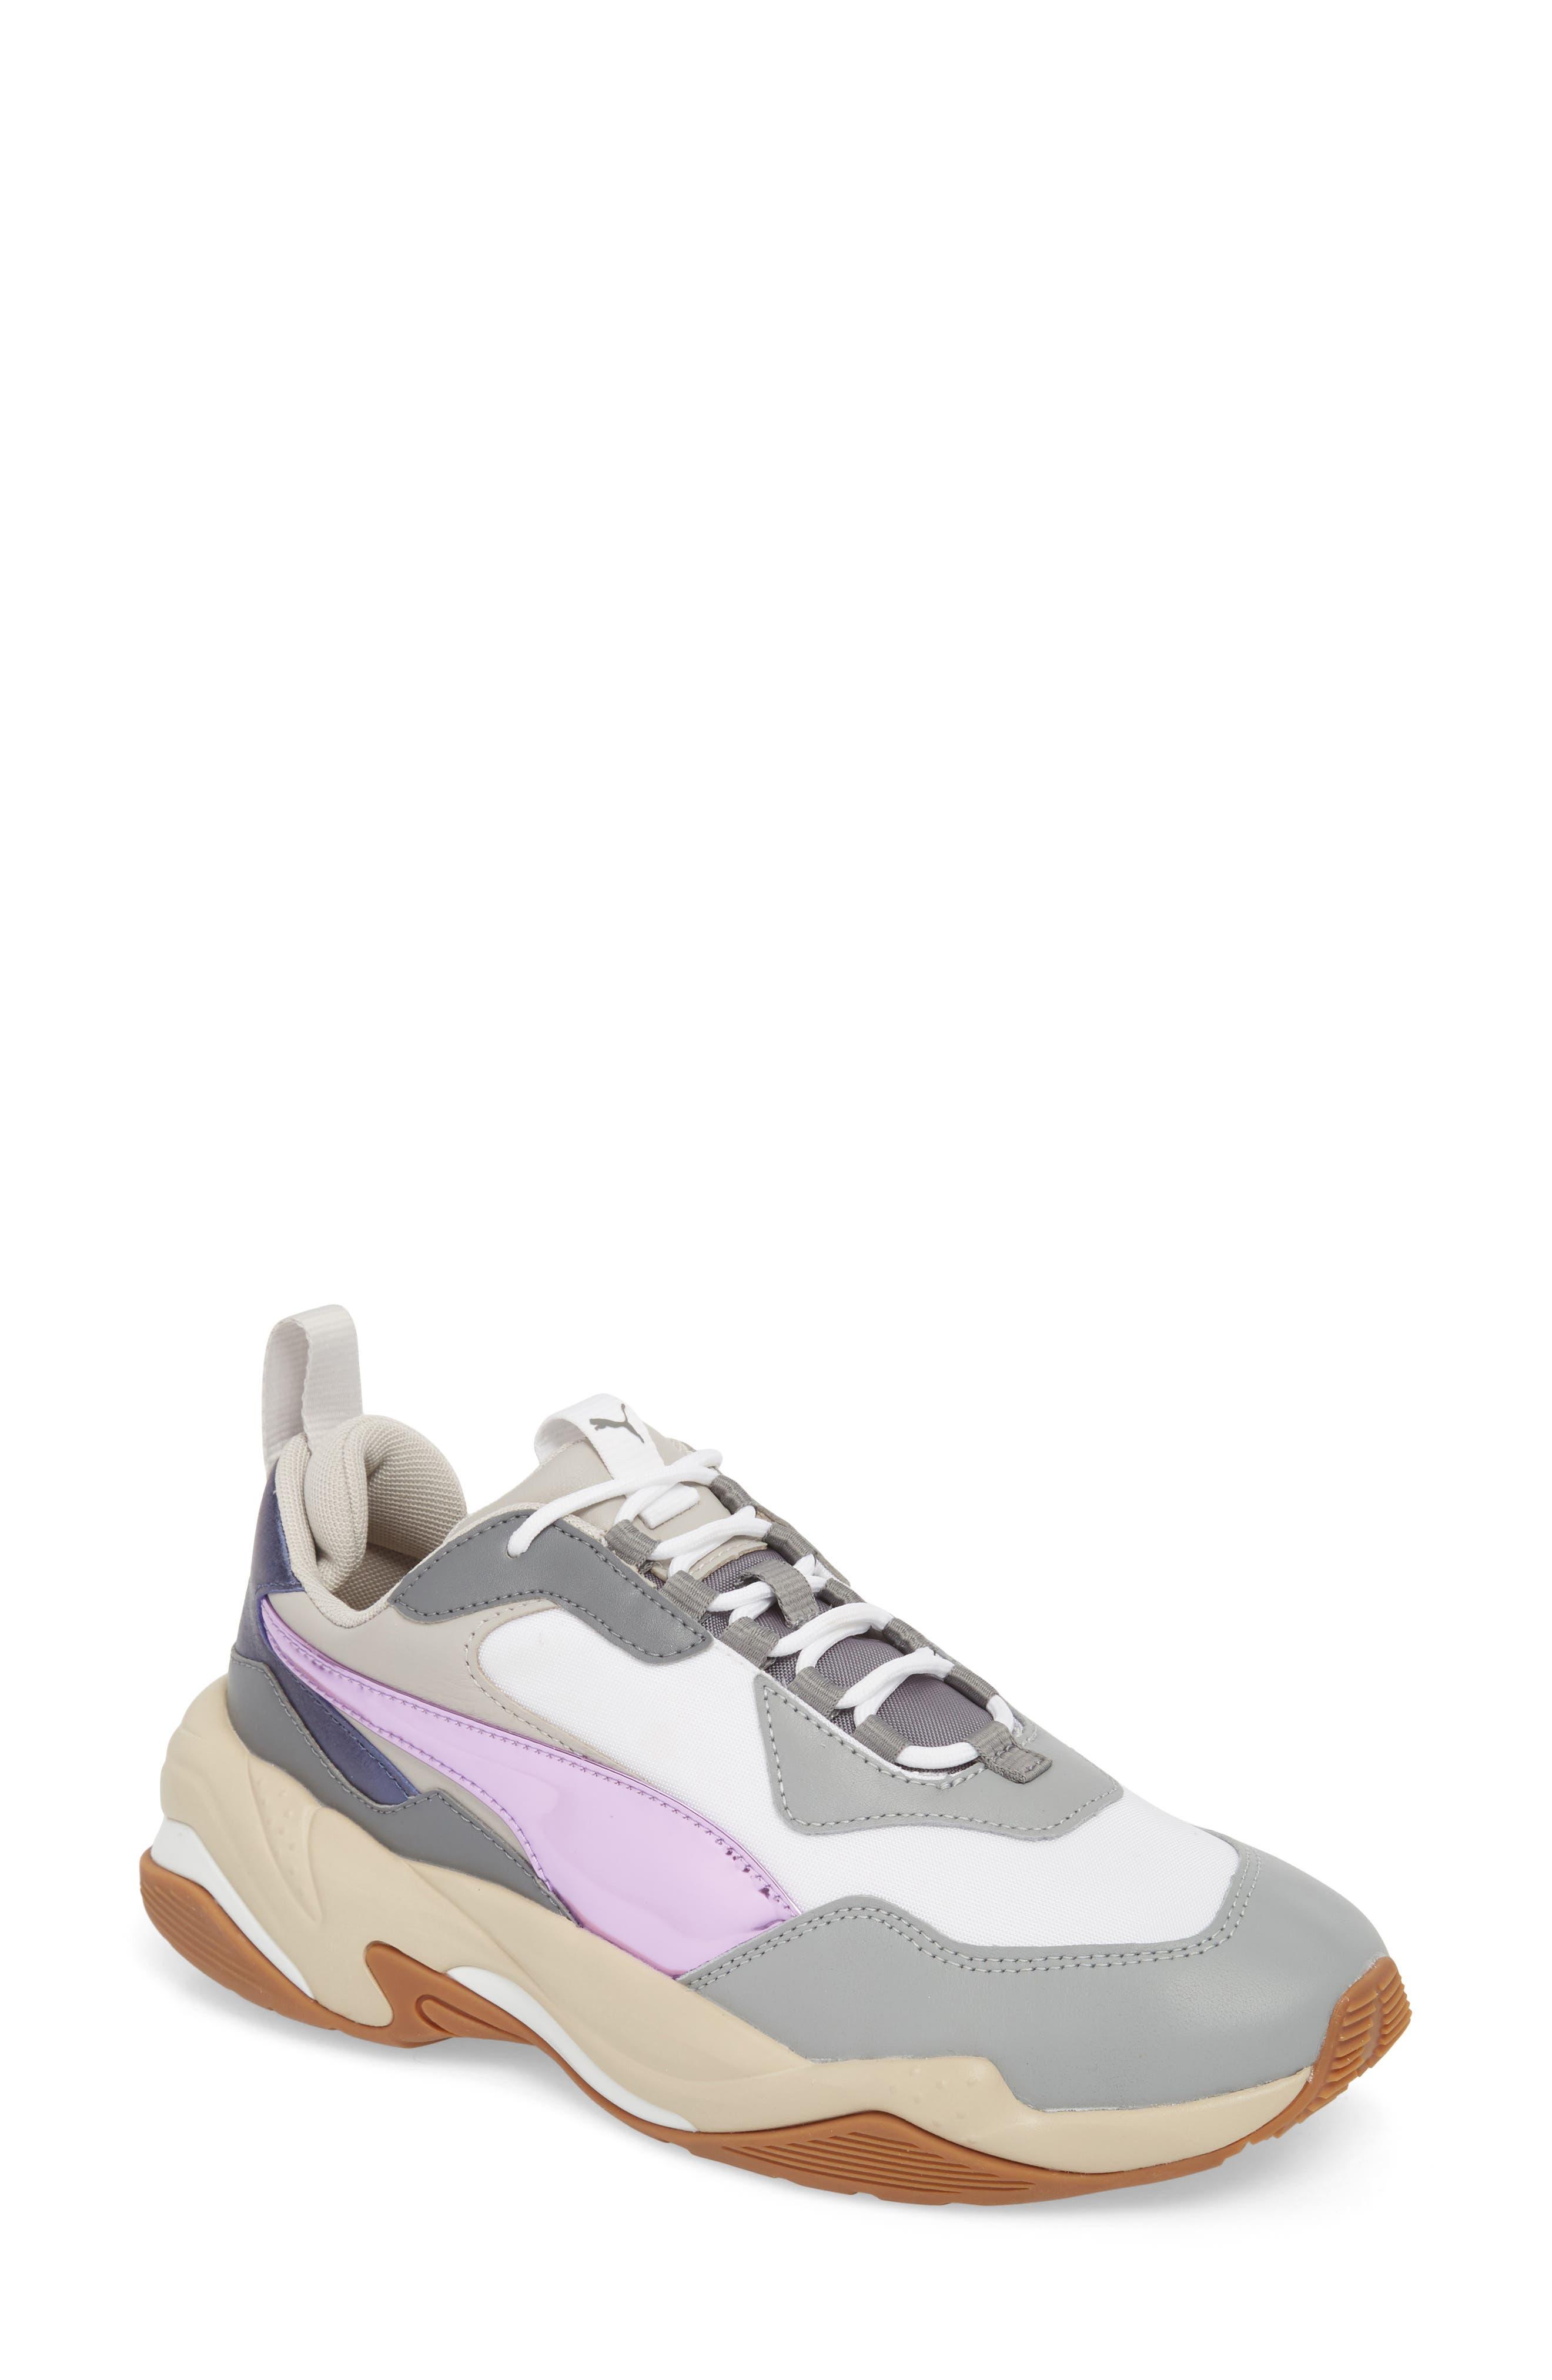 fenty puma shoes white